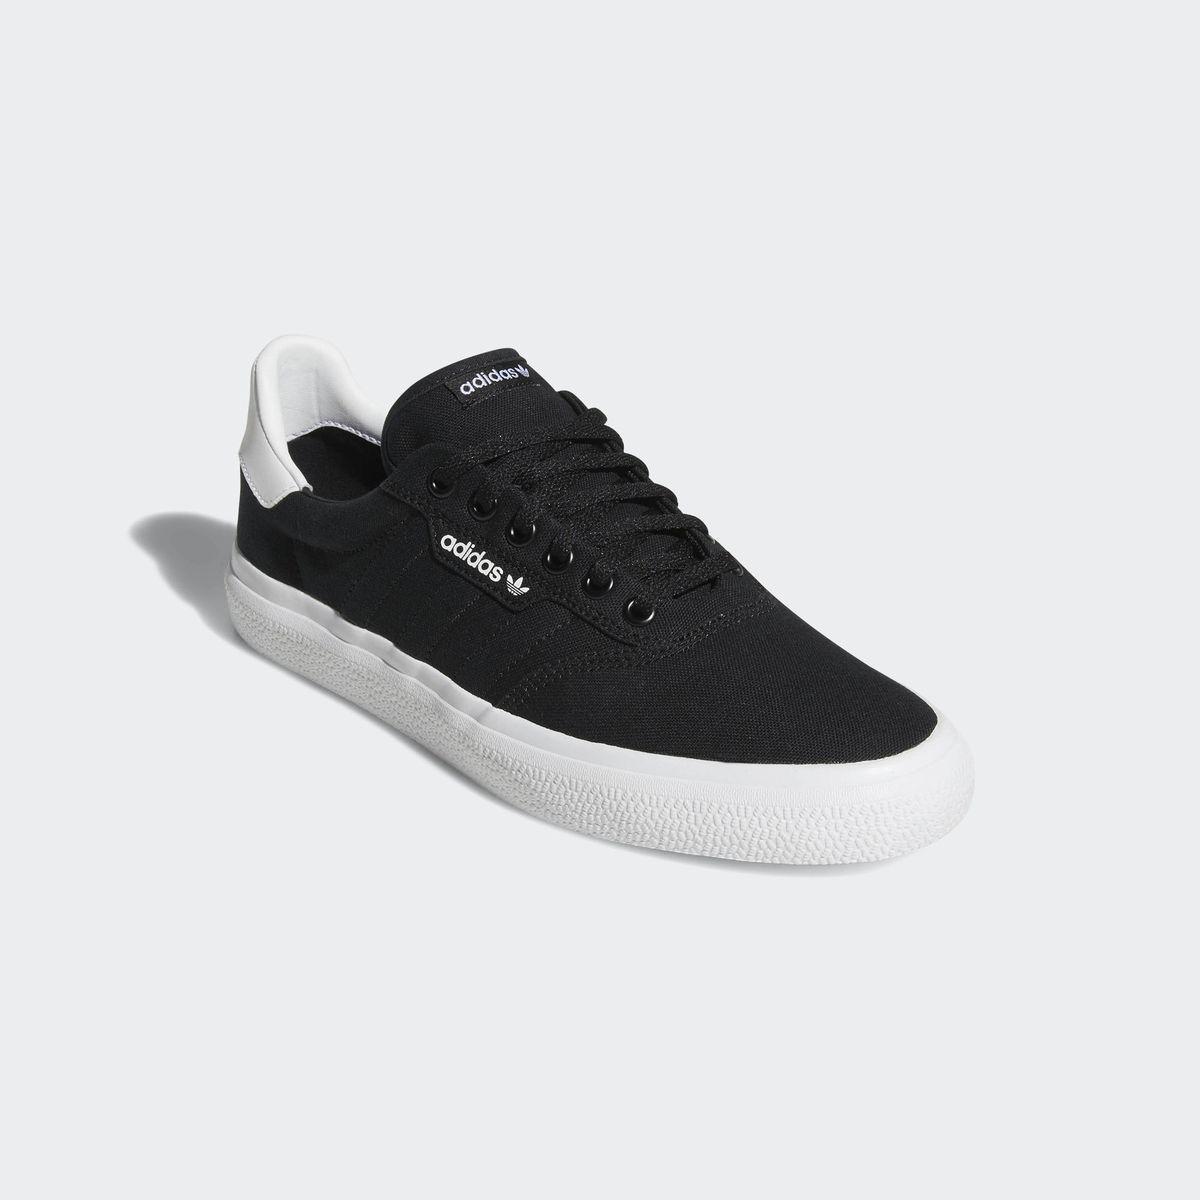 Chaussures Skate Adidas 3MC Vulc Core Black